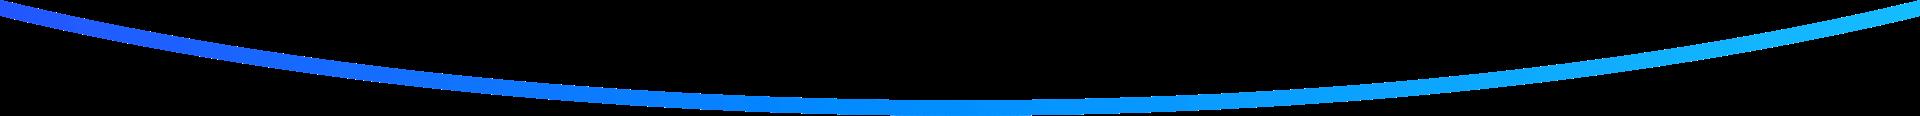 oval separator